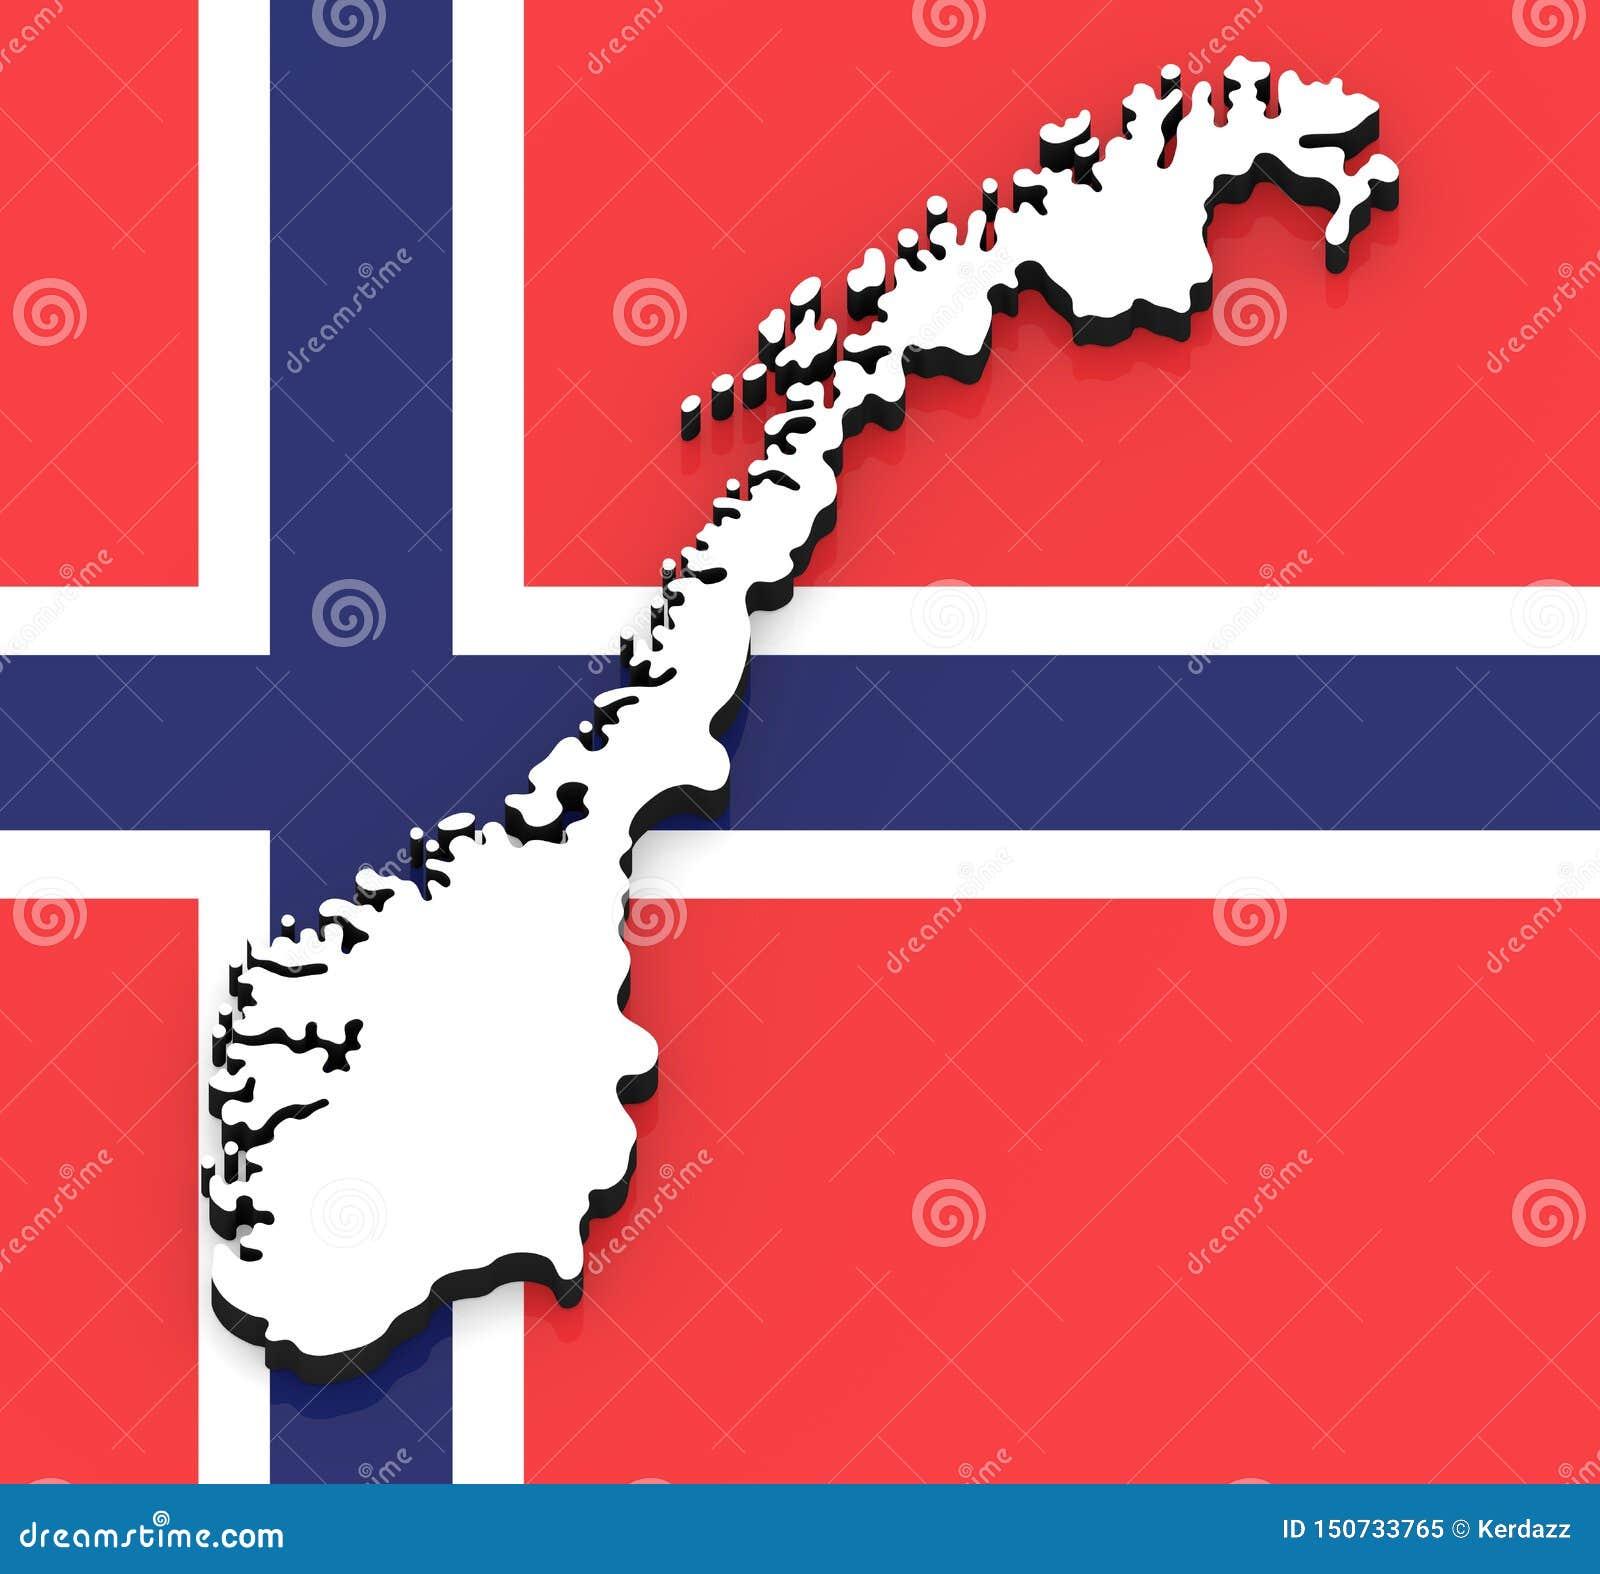 Mapa 3D de Noruega en la bandera nacional